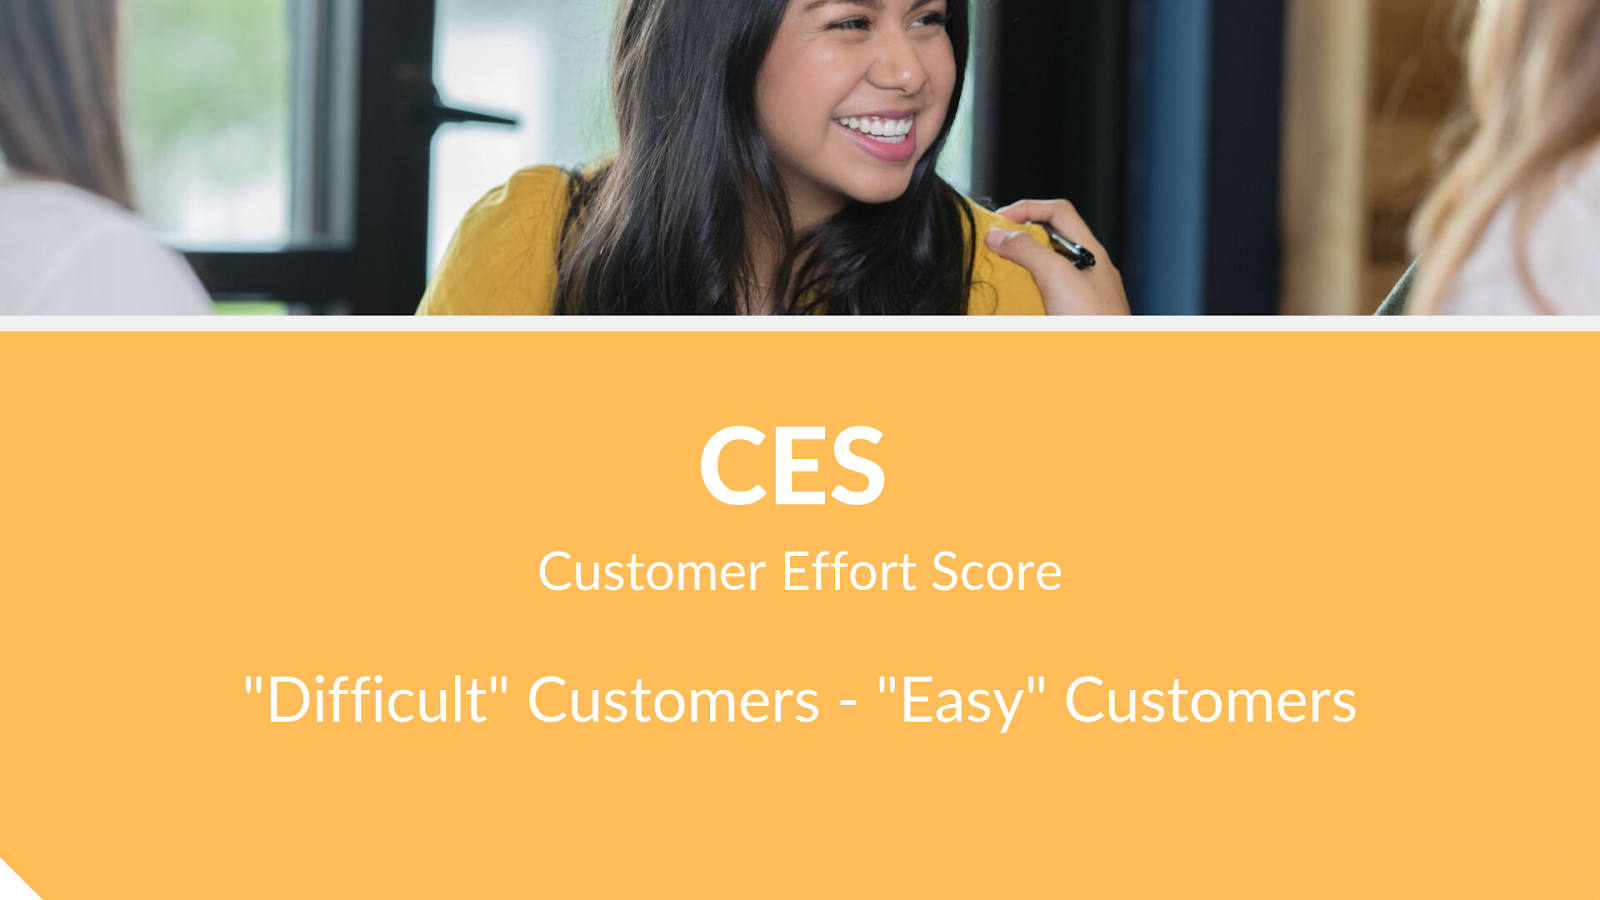 Customer Effort Score - measuring customer loyalty